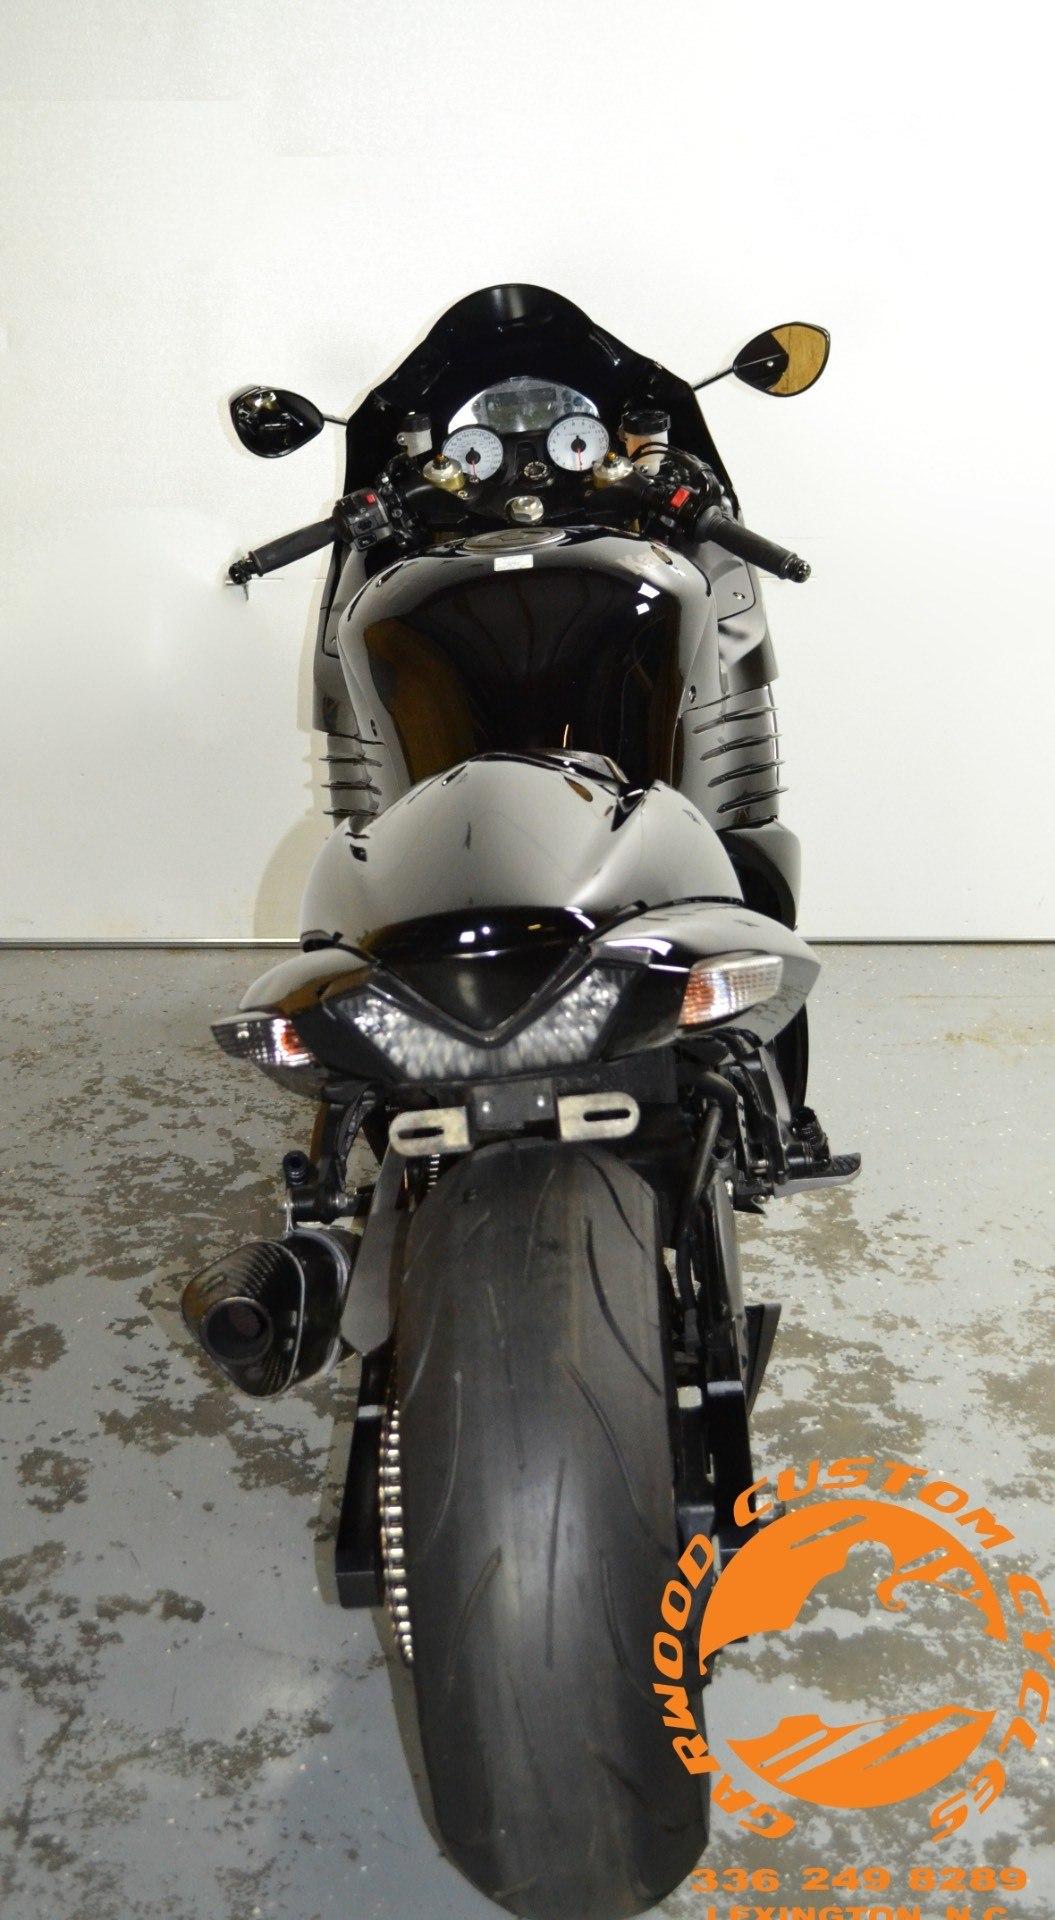 2008 Kawasaki Ninja® ZX™-14 in Lexington, North Carolina